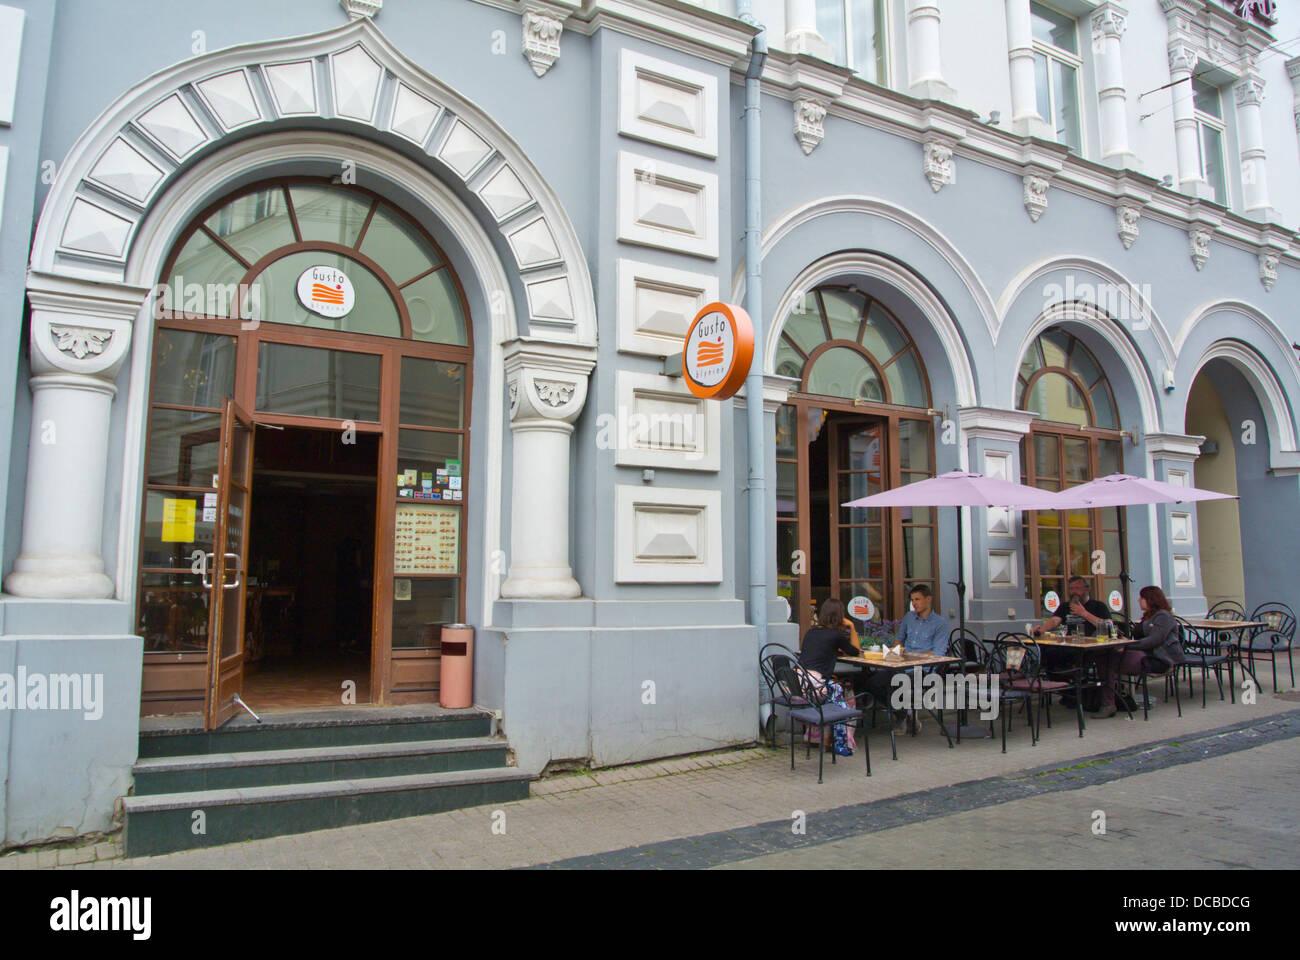 Gusto pancake restaurant old town Vilnius Lithuania Europe - Stock Image